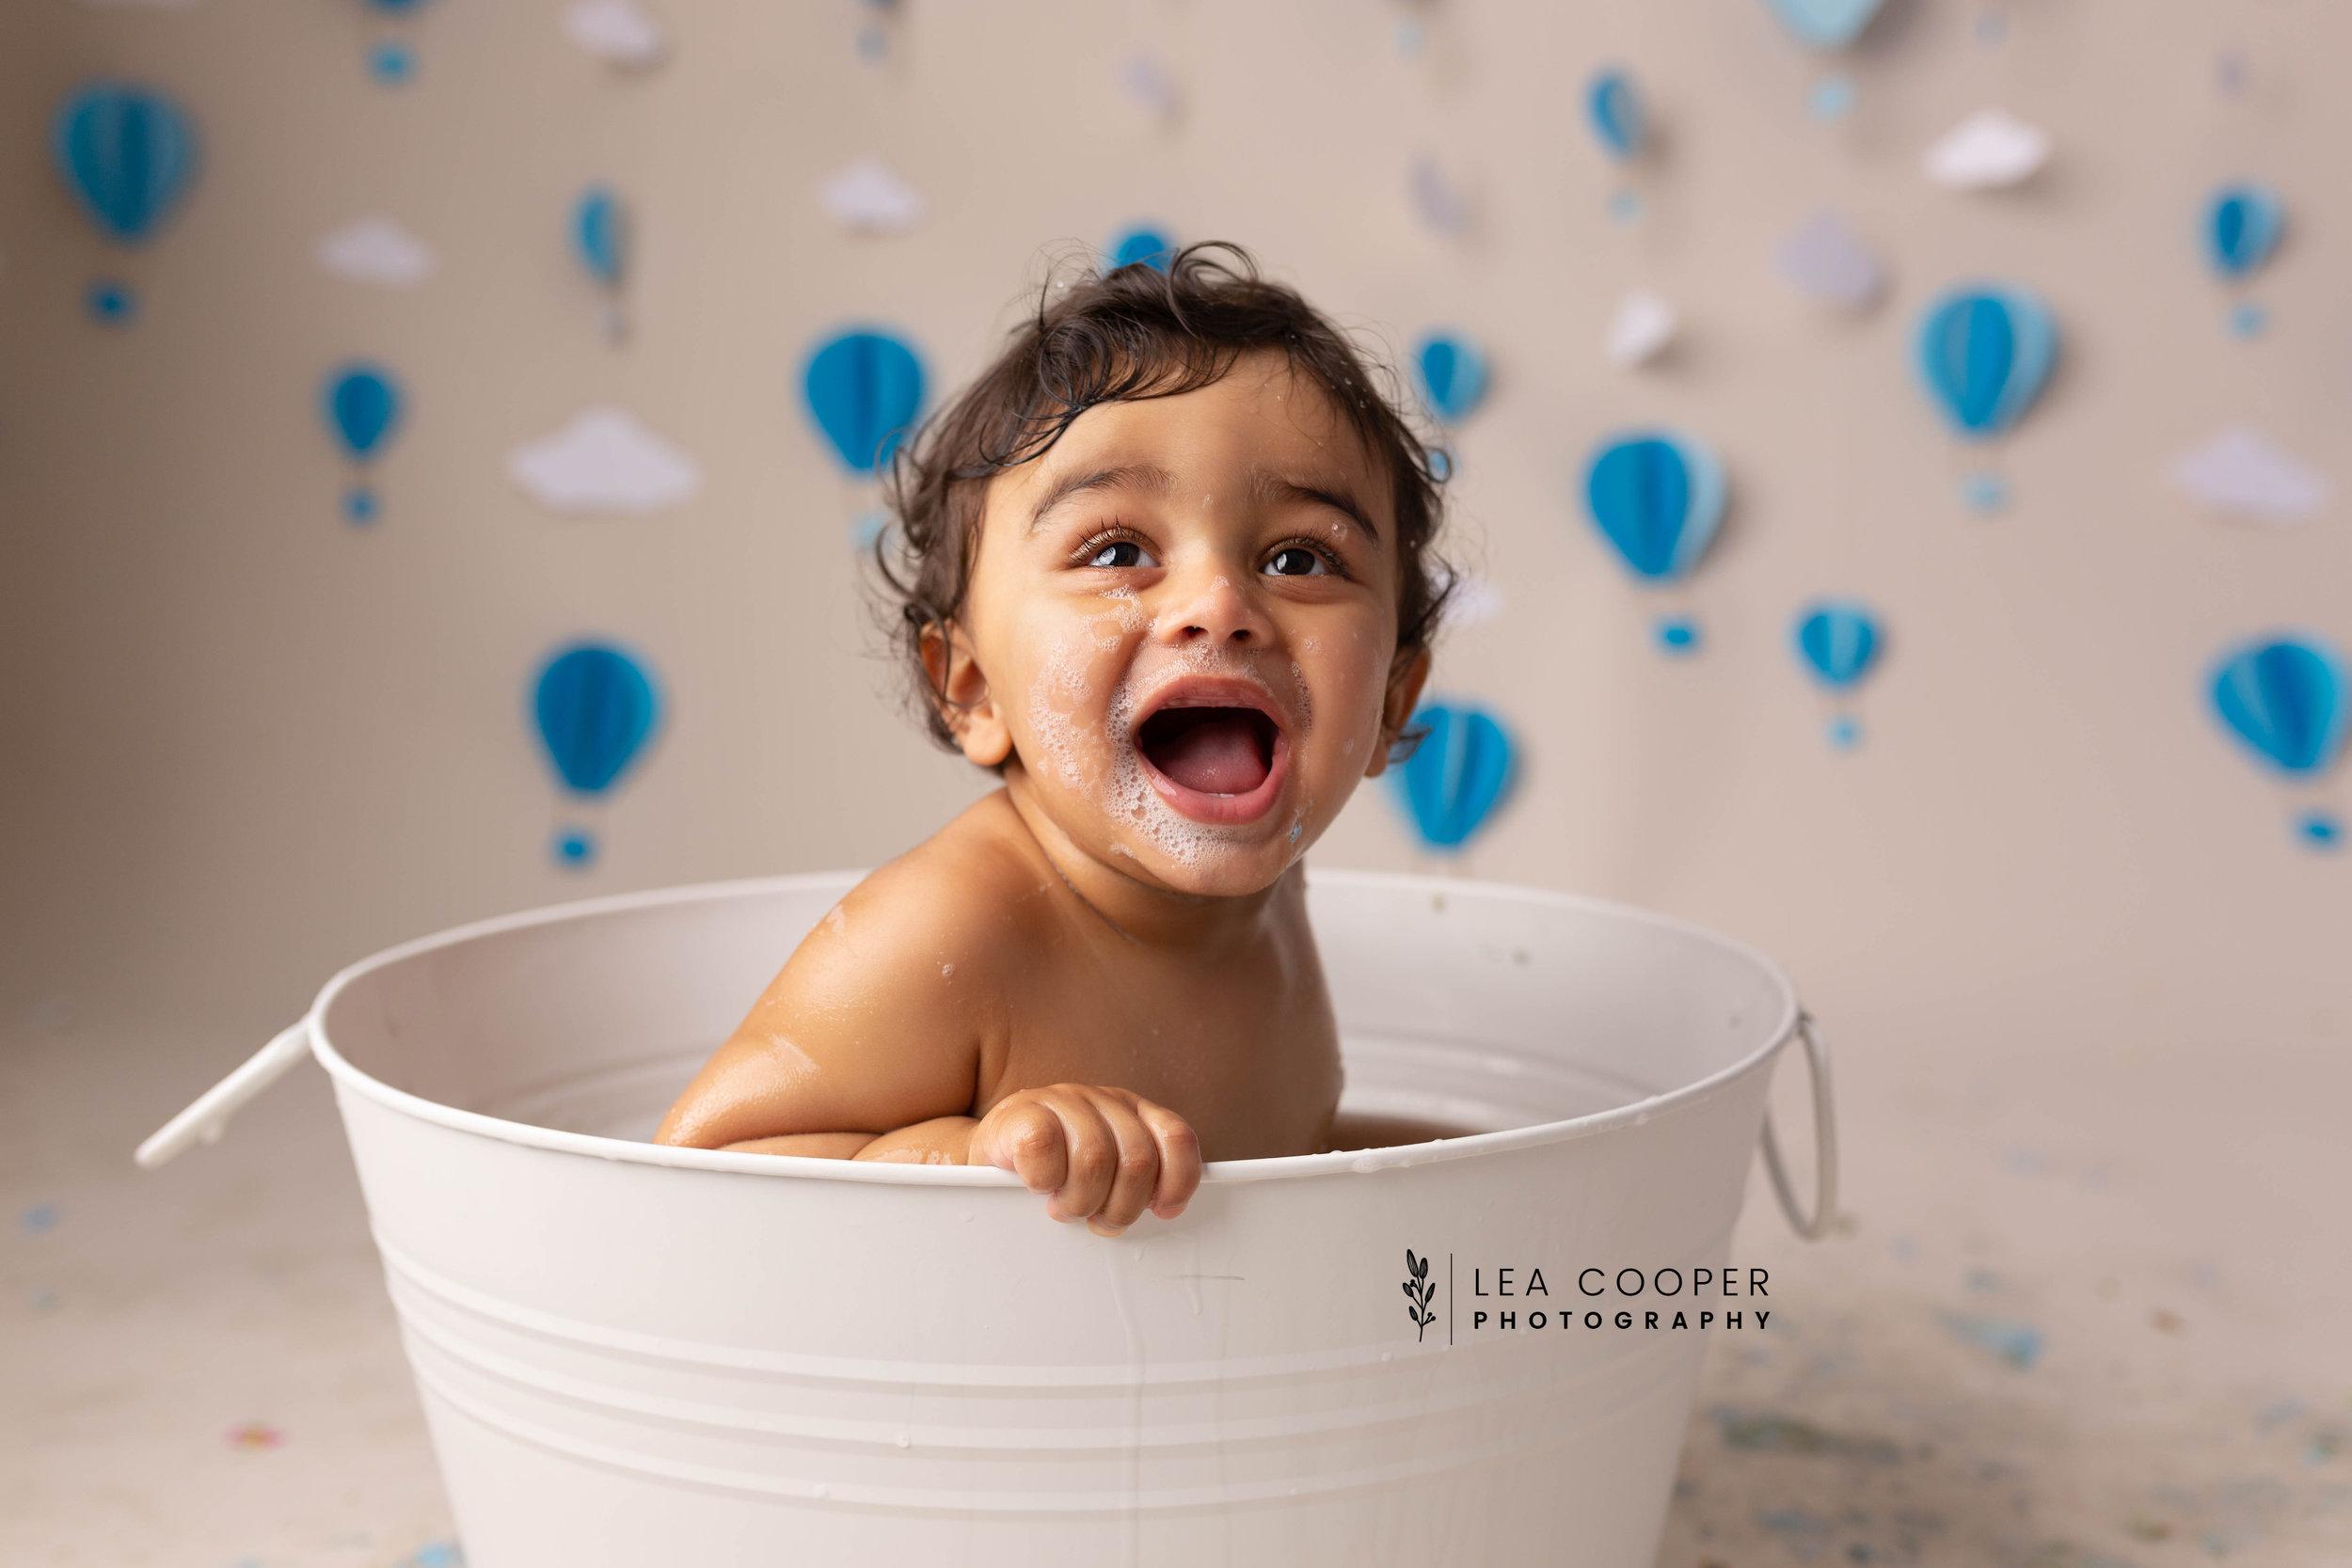 LEA-COOPER-PHOTOGRAPHY-CAKE-SMASH-PHOTOGRAPHER-WILLENALL-WOLVERHAMPTON-CHILD-PHOTOSHOOT-1ST—BIRTHDAY-PICTURES-WEDNESBURY-WALSALL-DUDLEY-WEST-MIDLANDS-UK-42.JPG